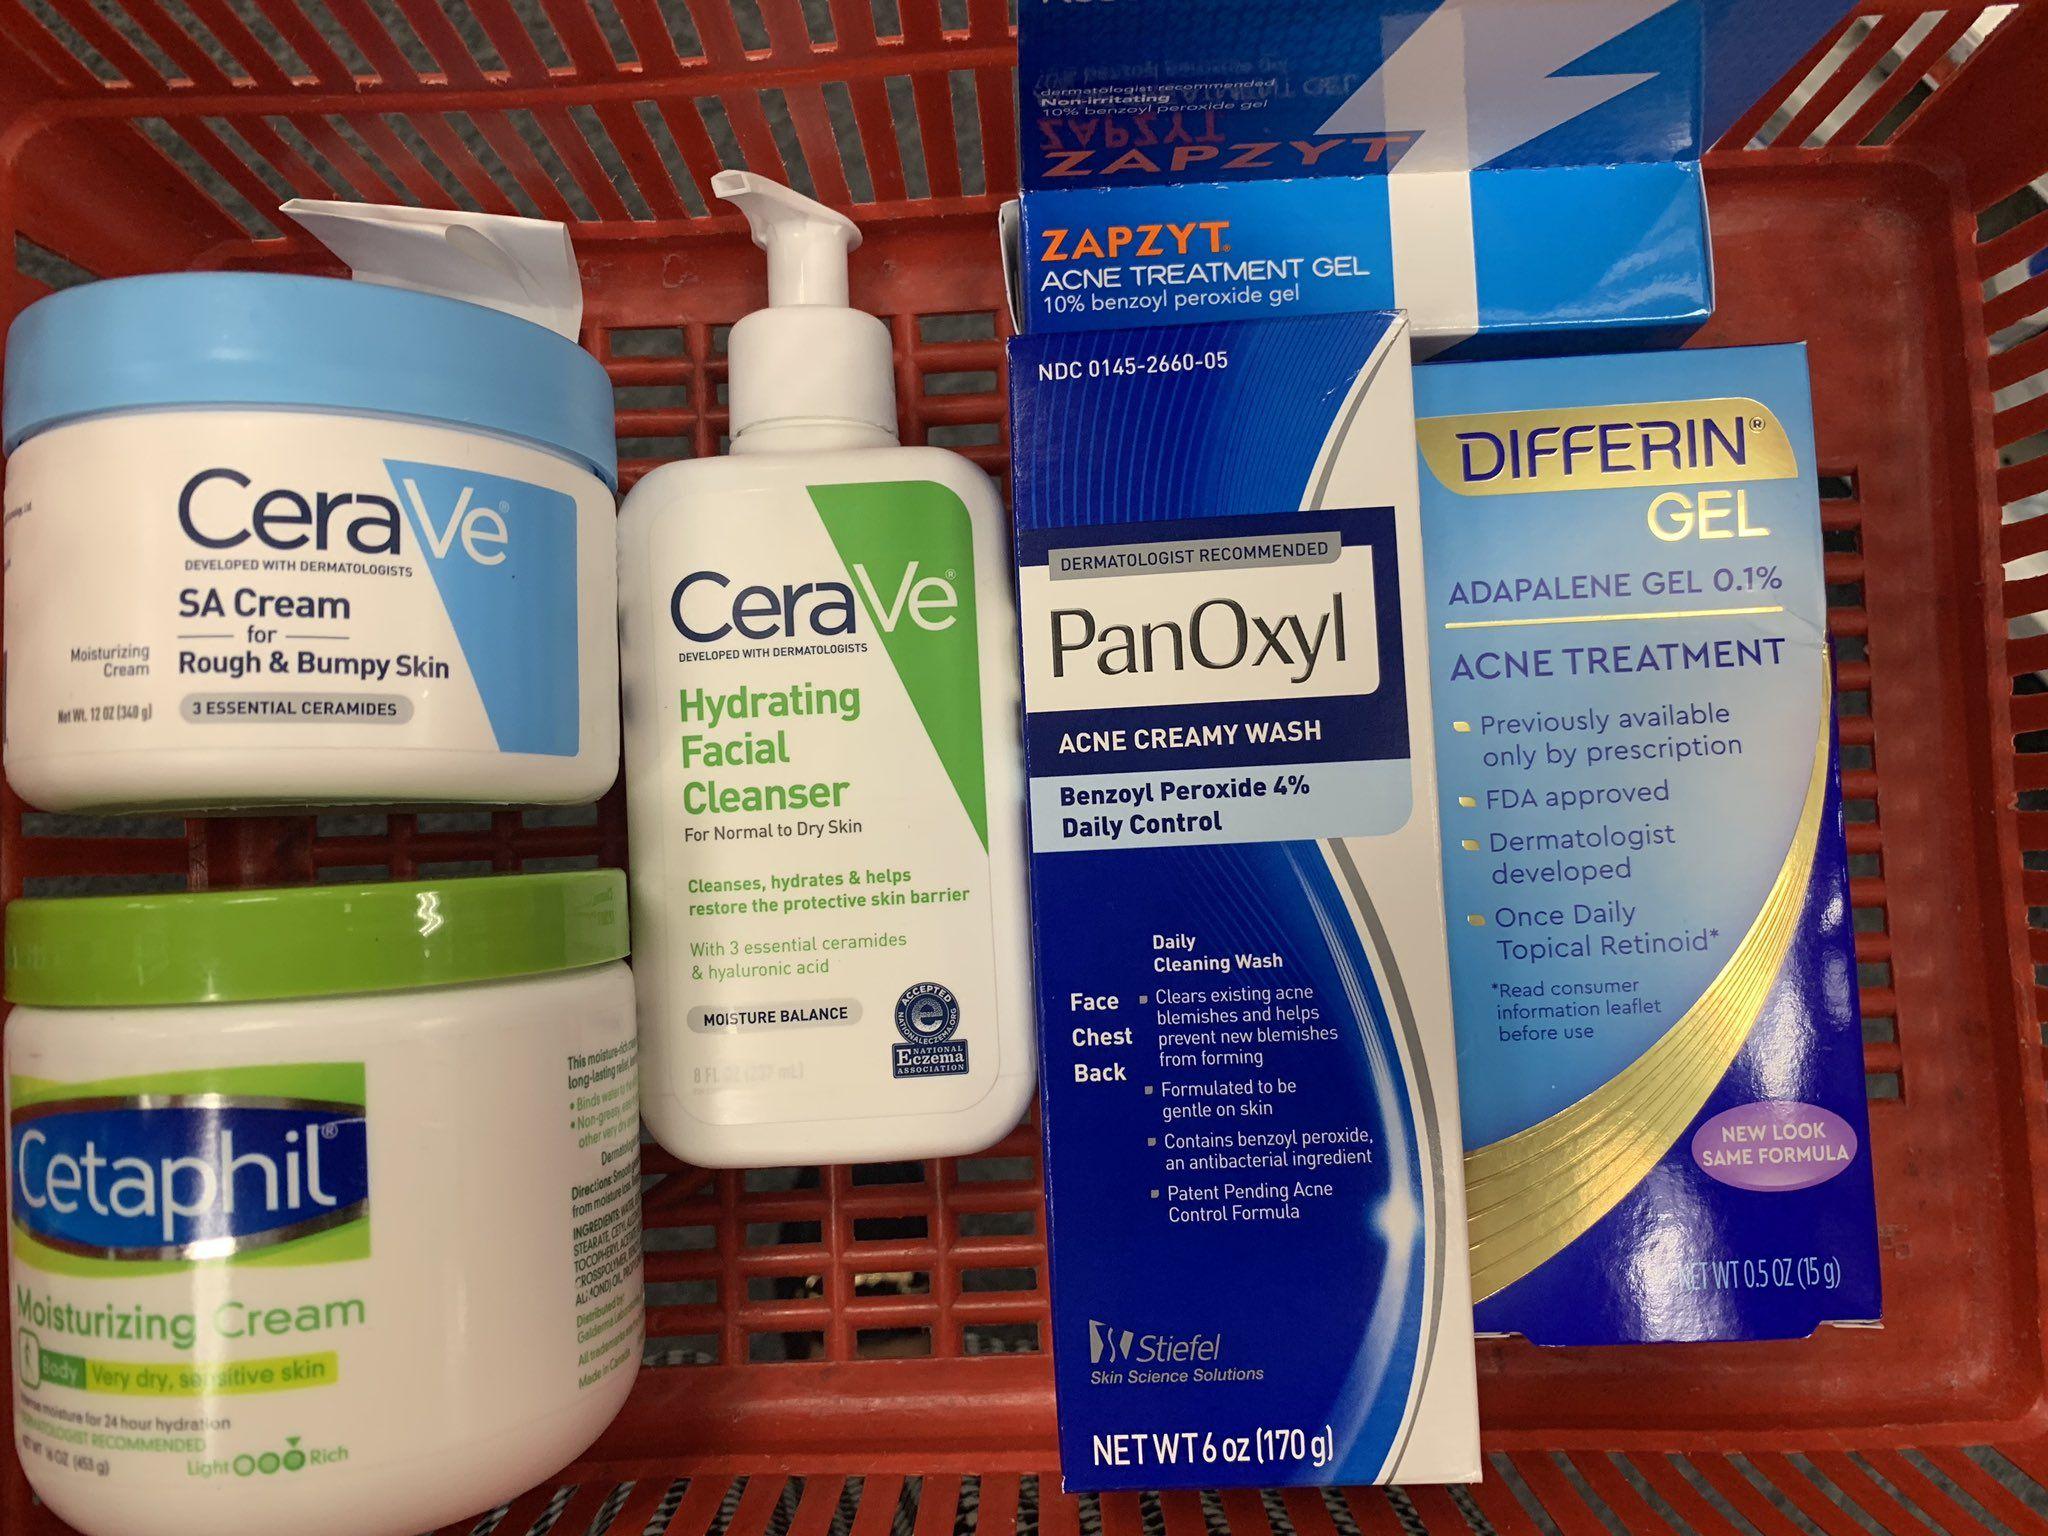 Neutrogena On-the-Spot Acne Treatment Benzoyl Peroxide Acne Medication 21 grams | Shopee Singapore